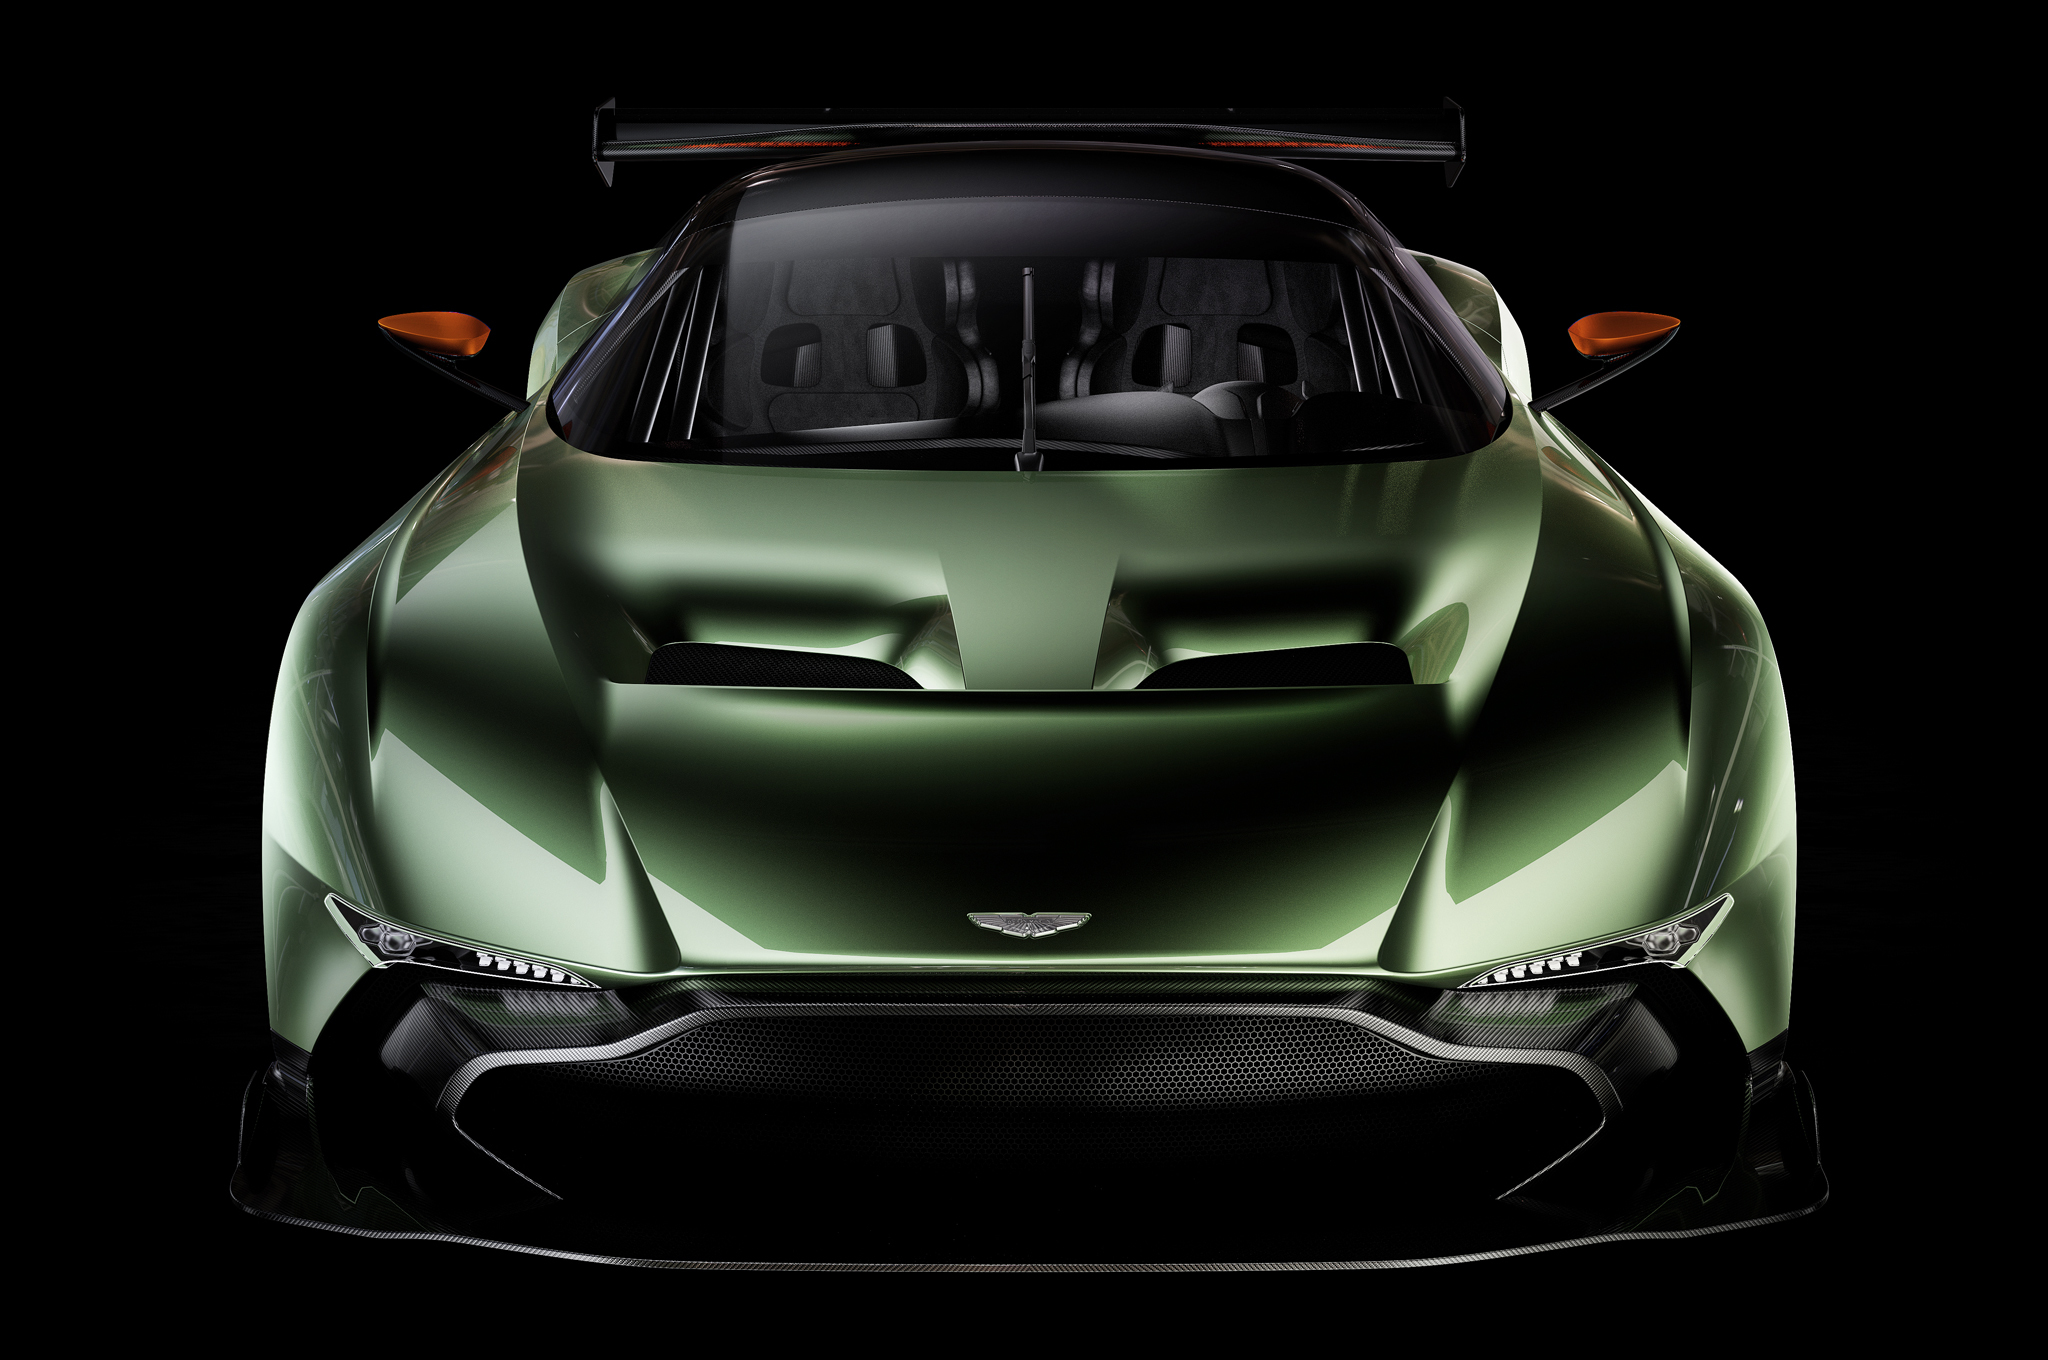 Aston Martin Vulcan For Desktop